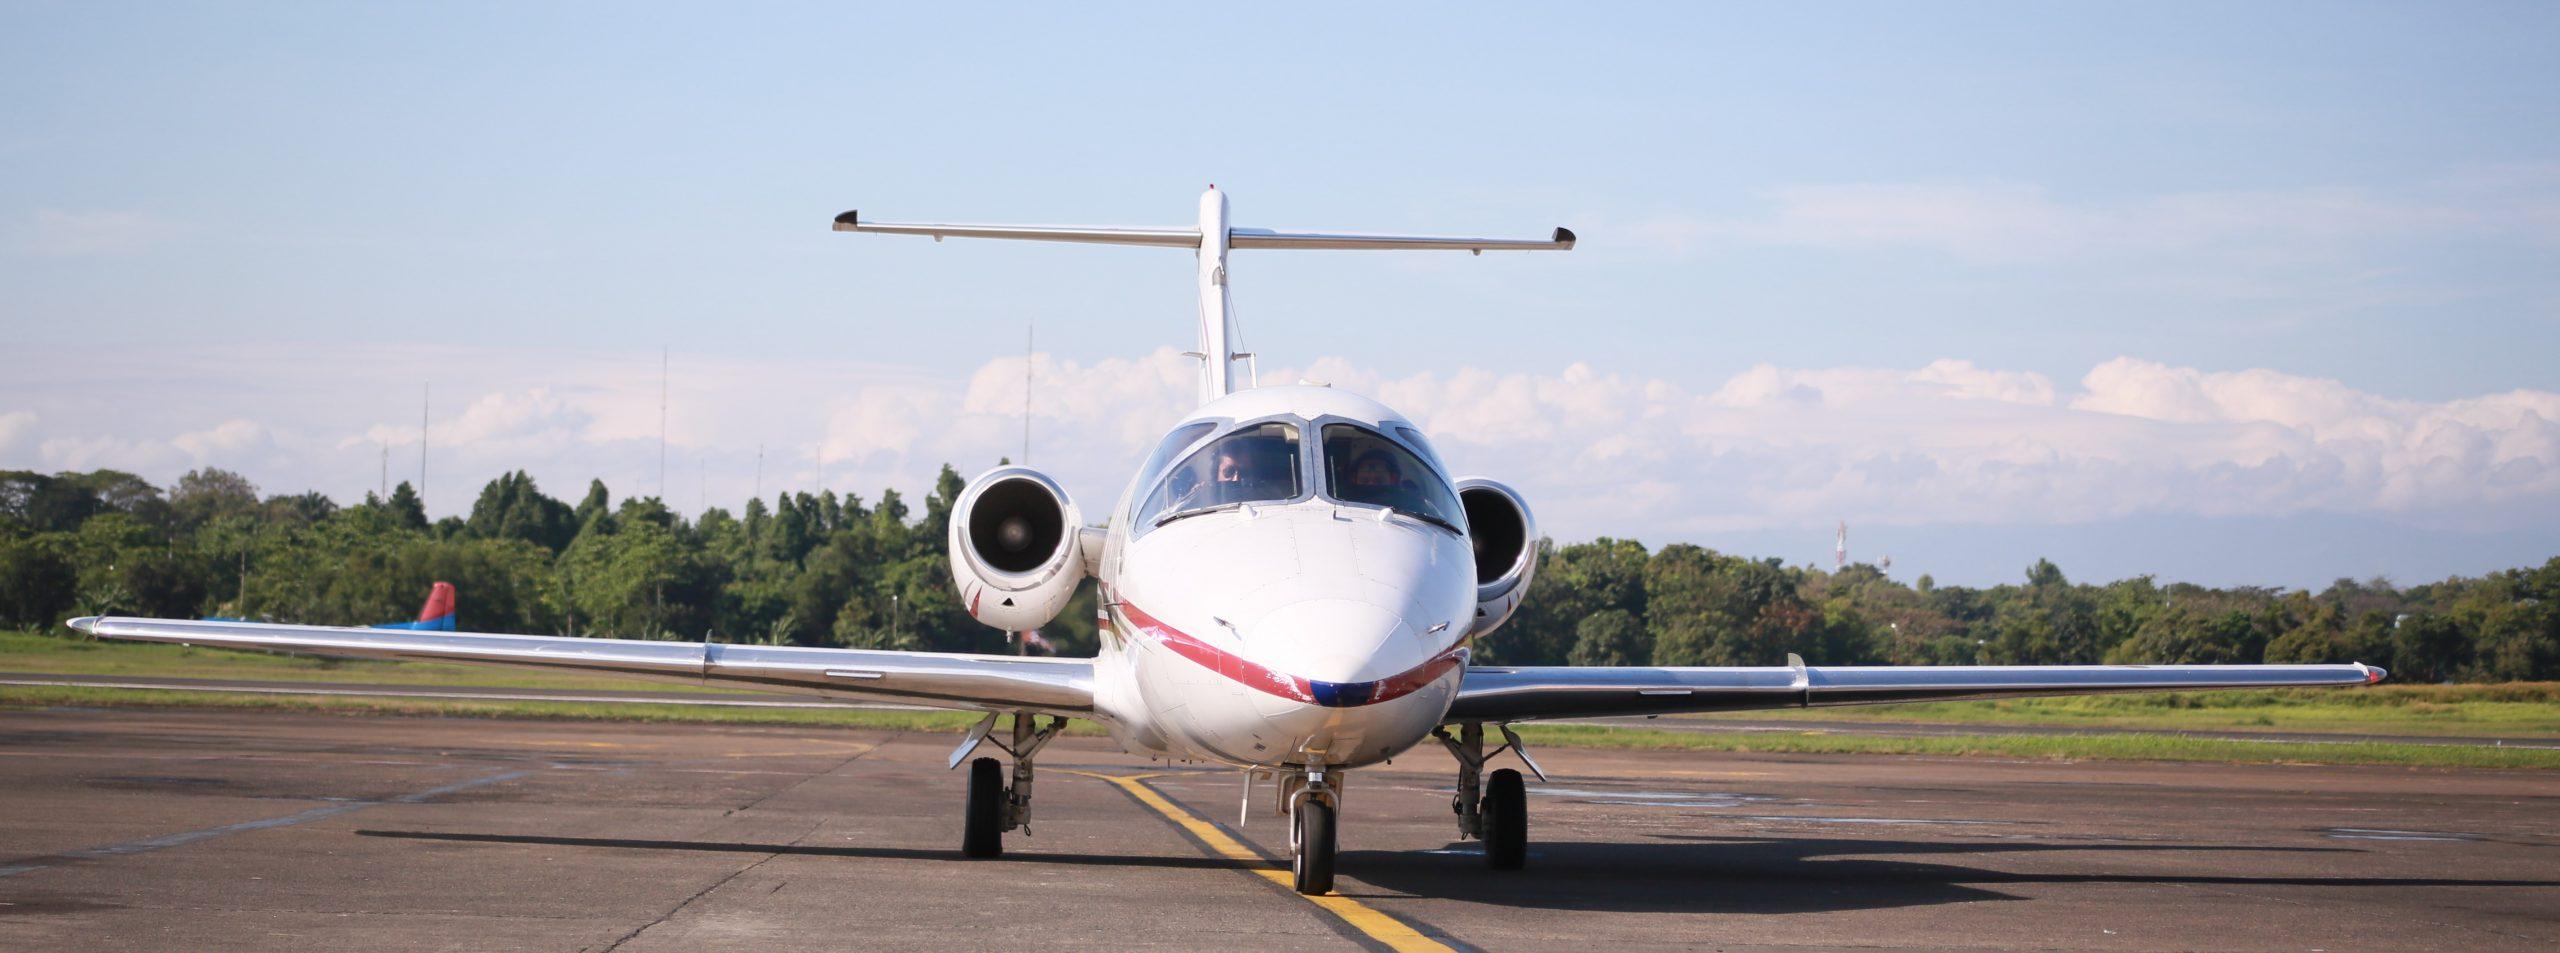 Private Jet & Air Ambulance